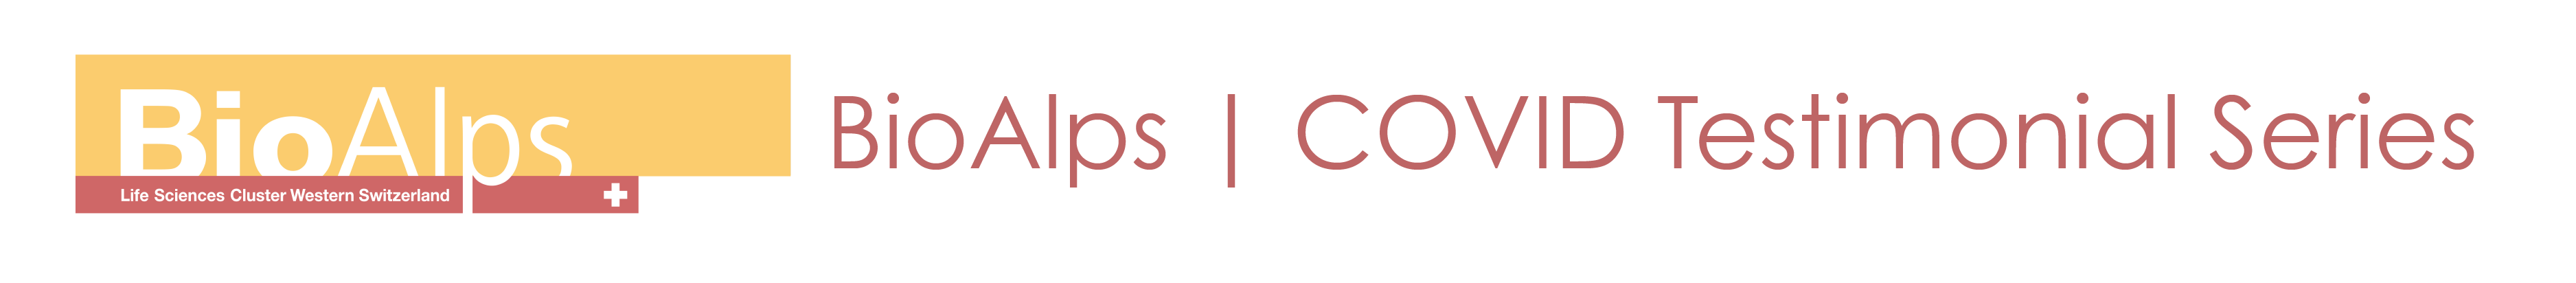 BioAlps | COVID Testimonial Series